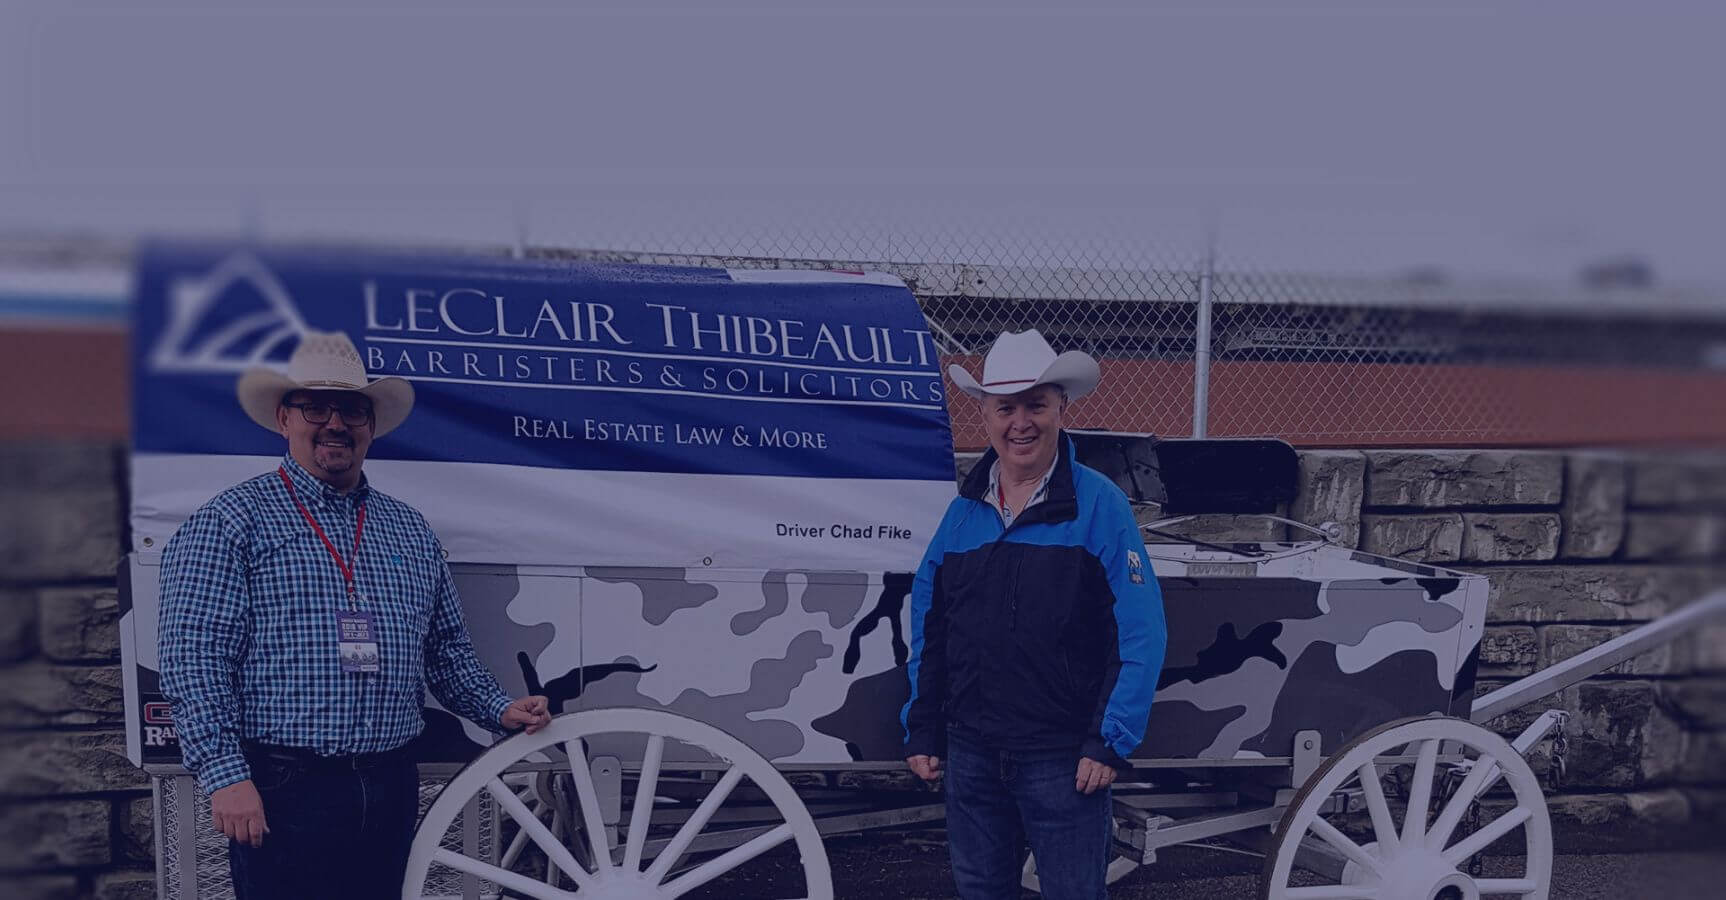 LeClair Thibeault, Calgary